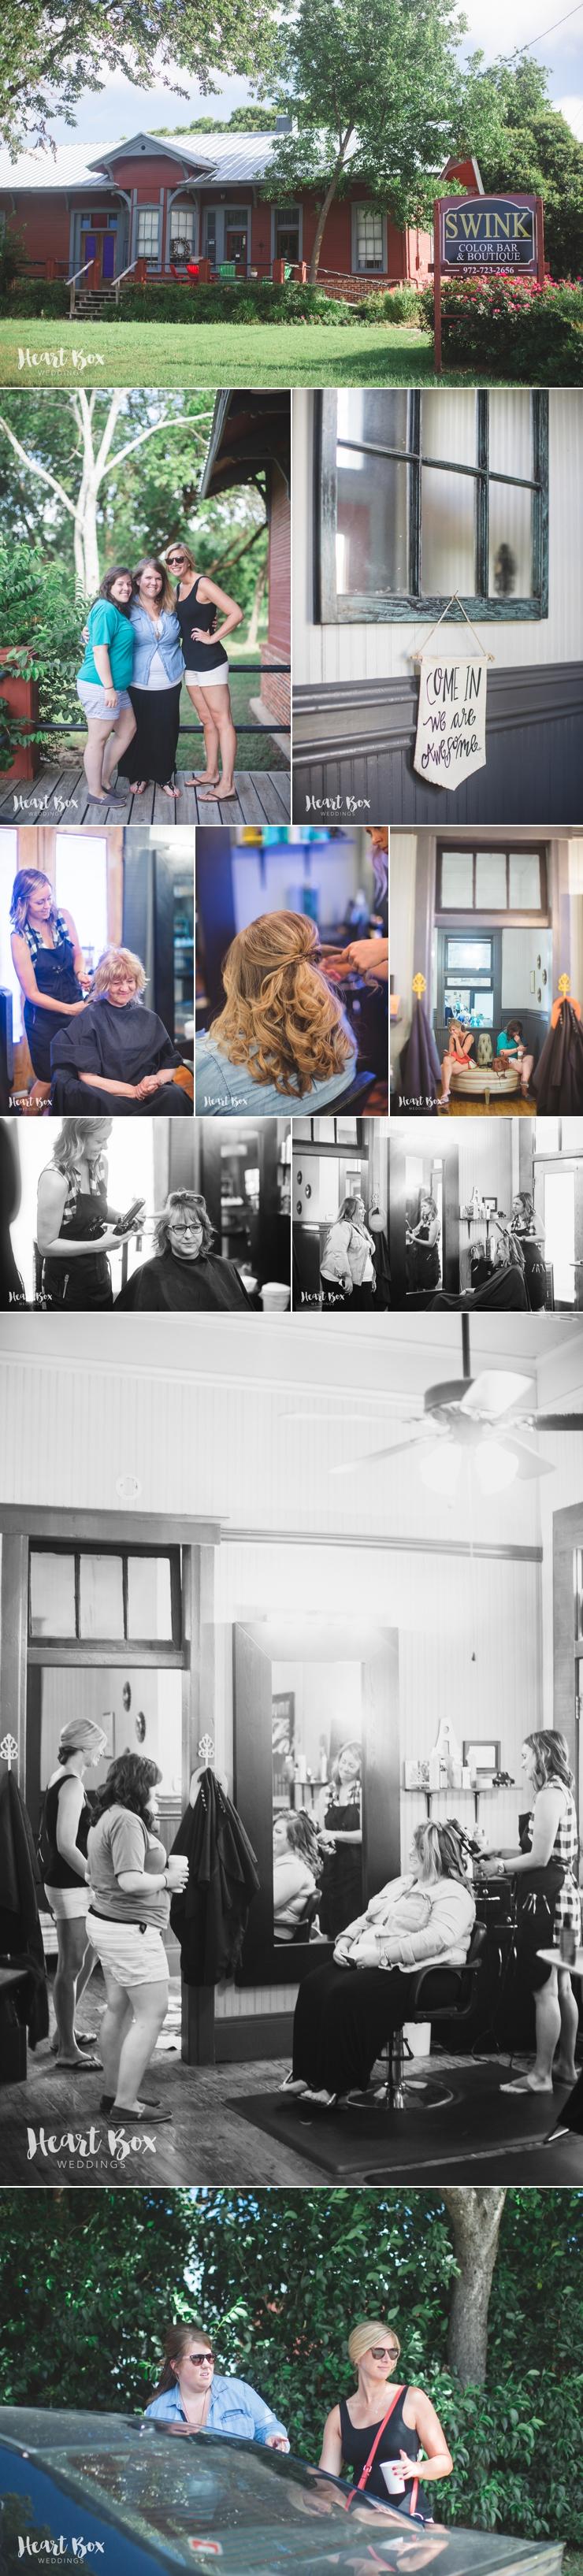 Ryan Blog Collages 1.jpg